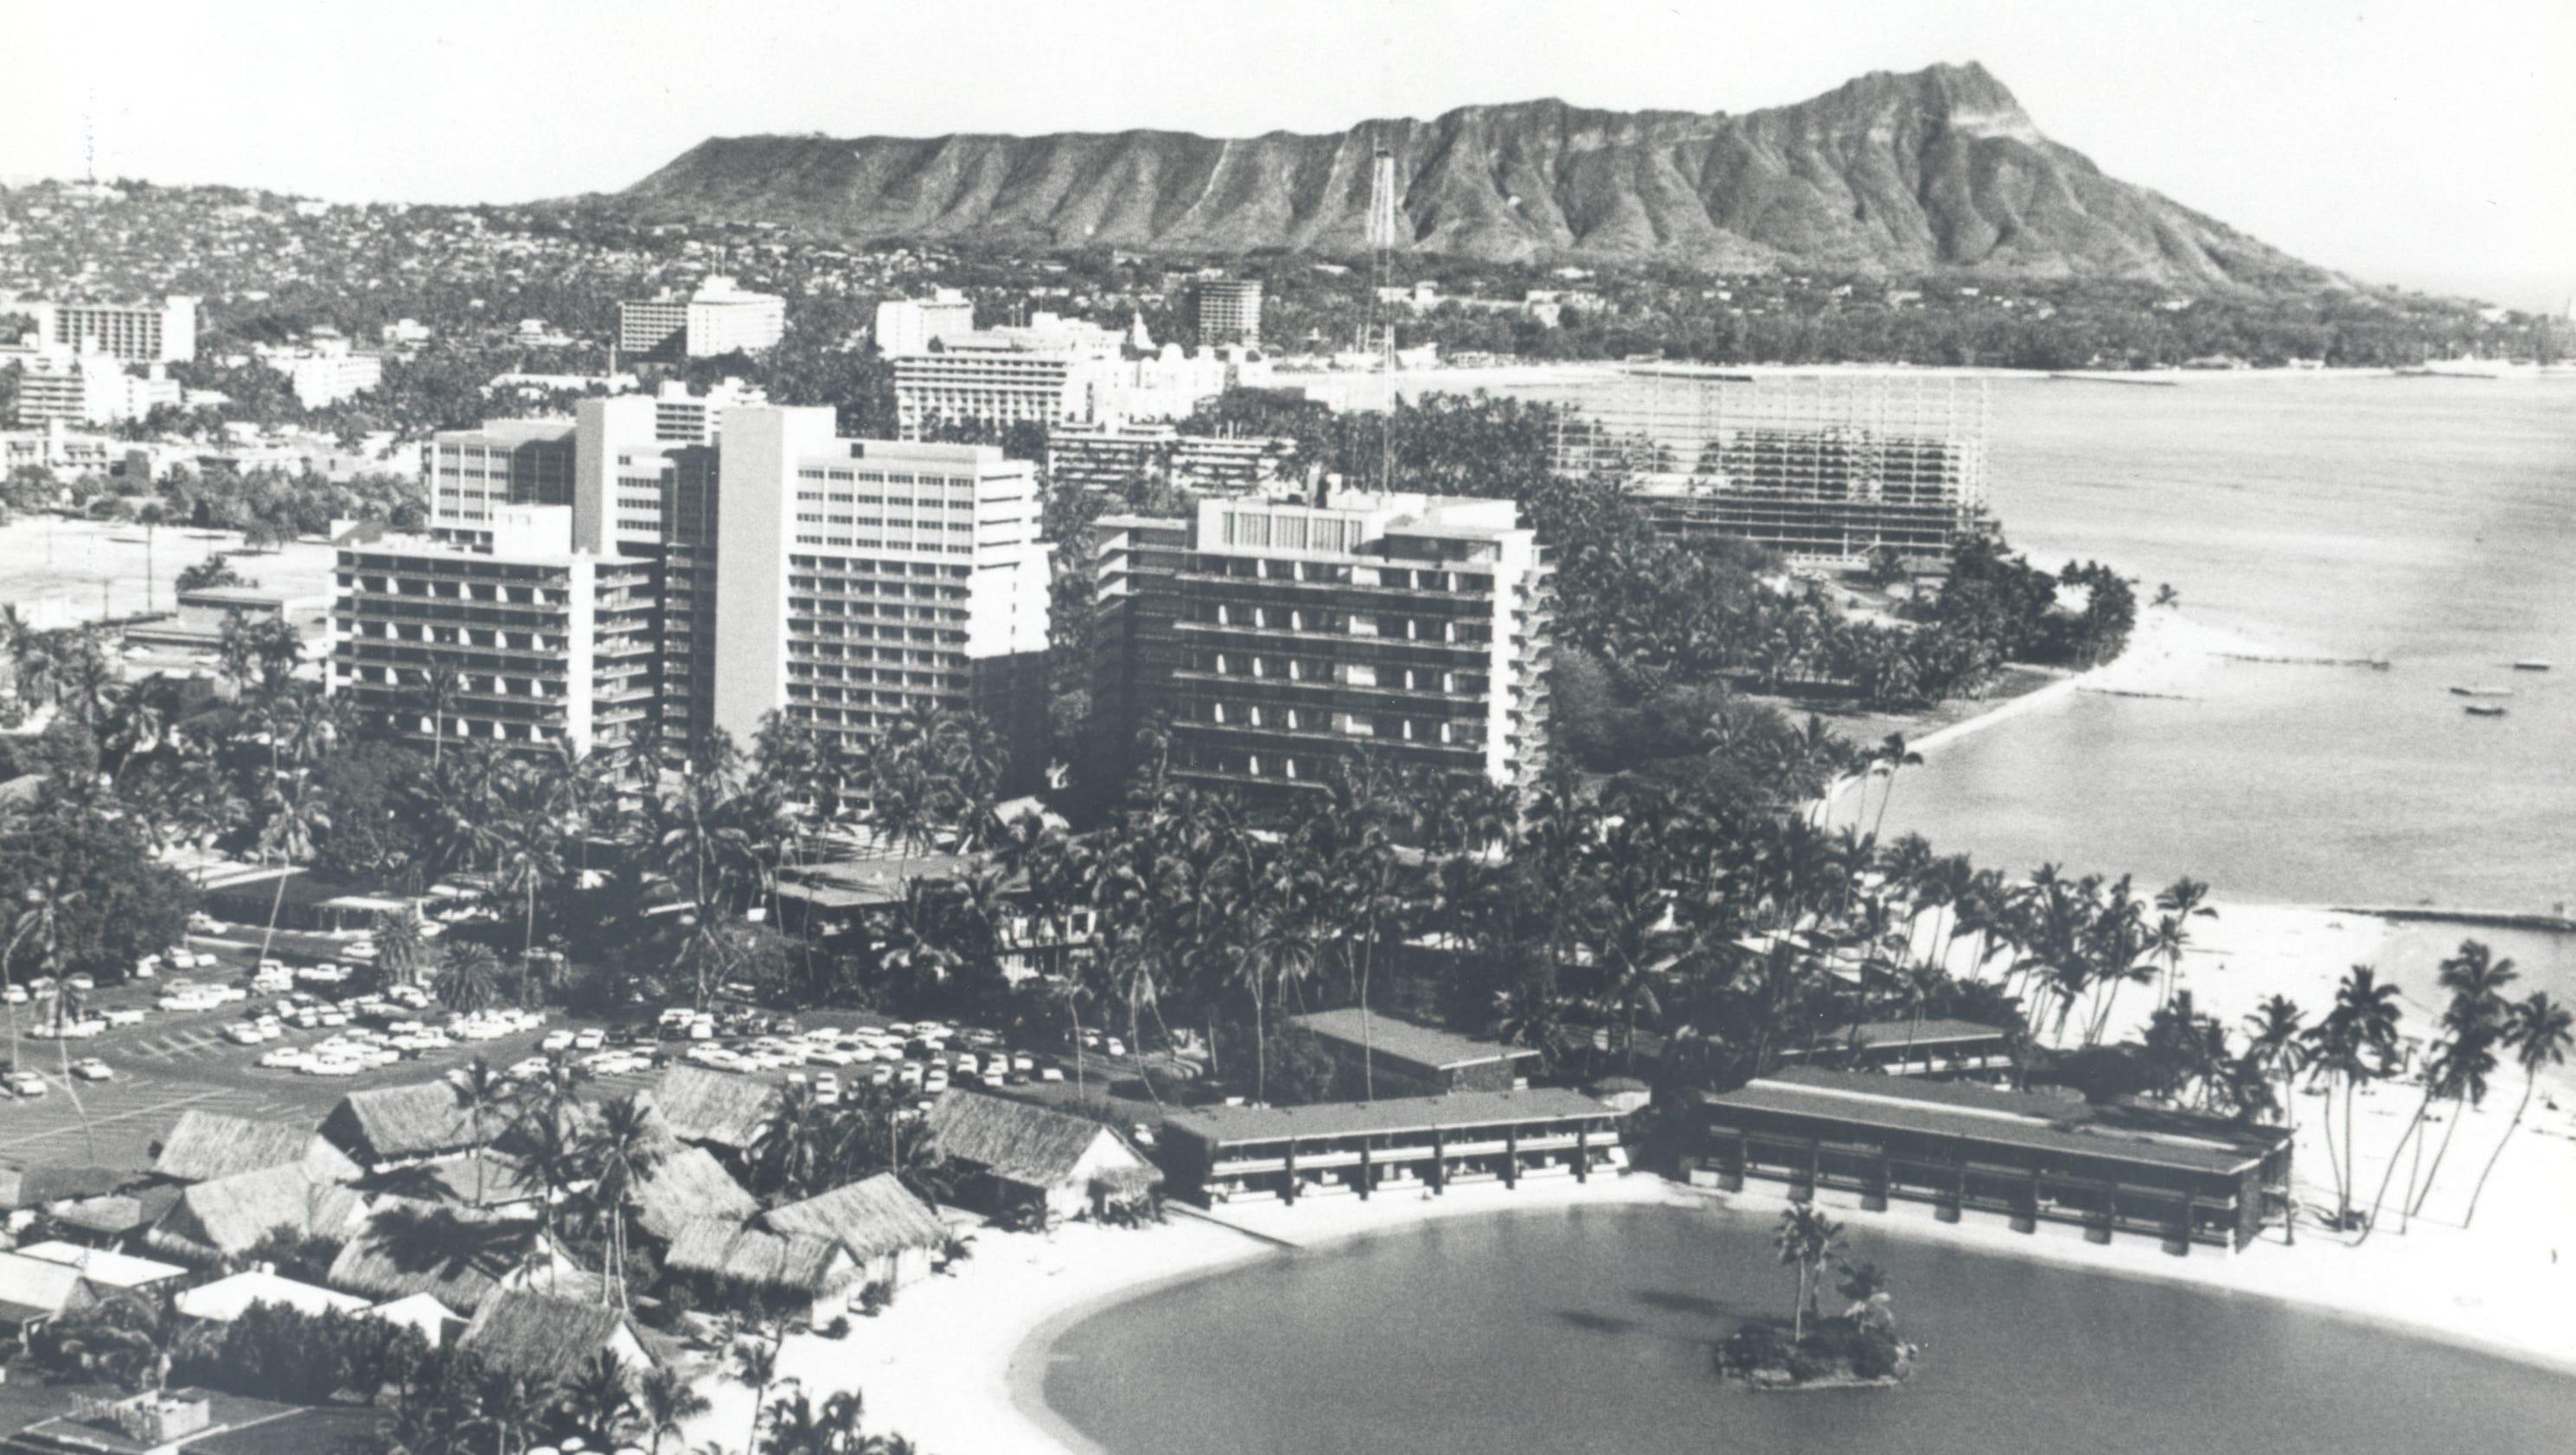 Hilton Hawaiian Village Waikiki Beach Photo Gallery: Hilton Celebrates Its Historic Hotels